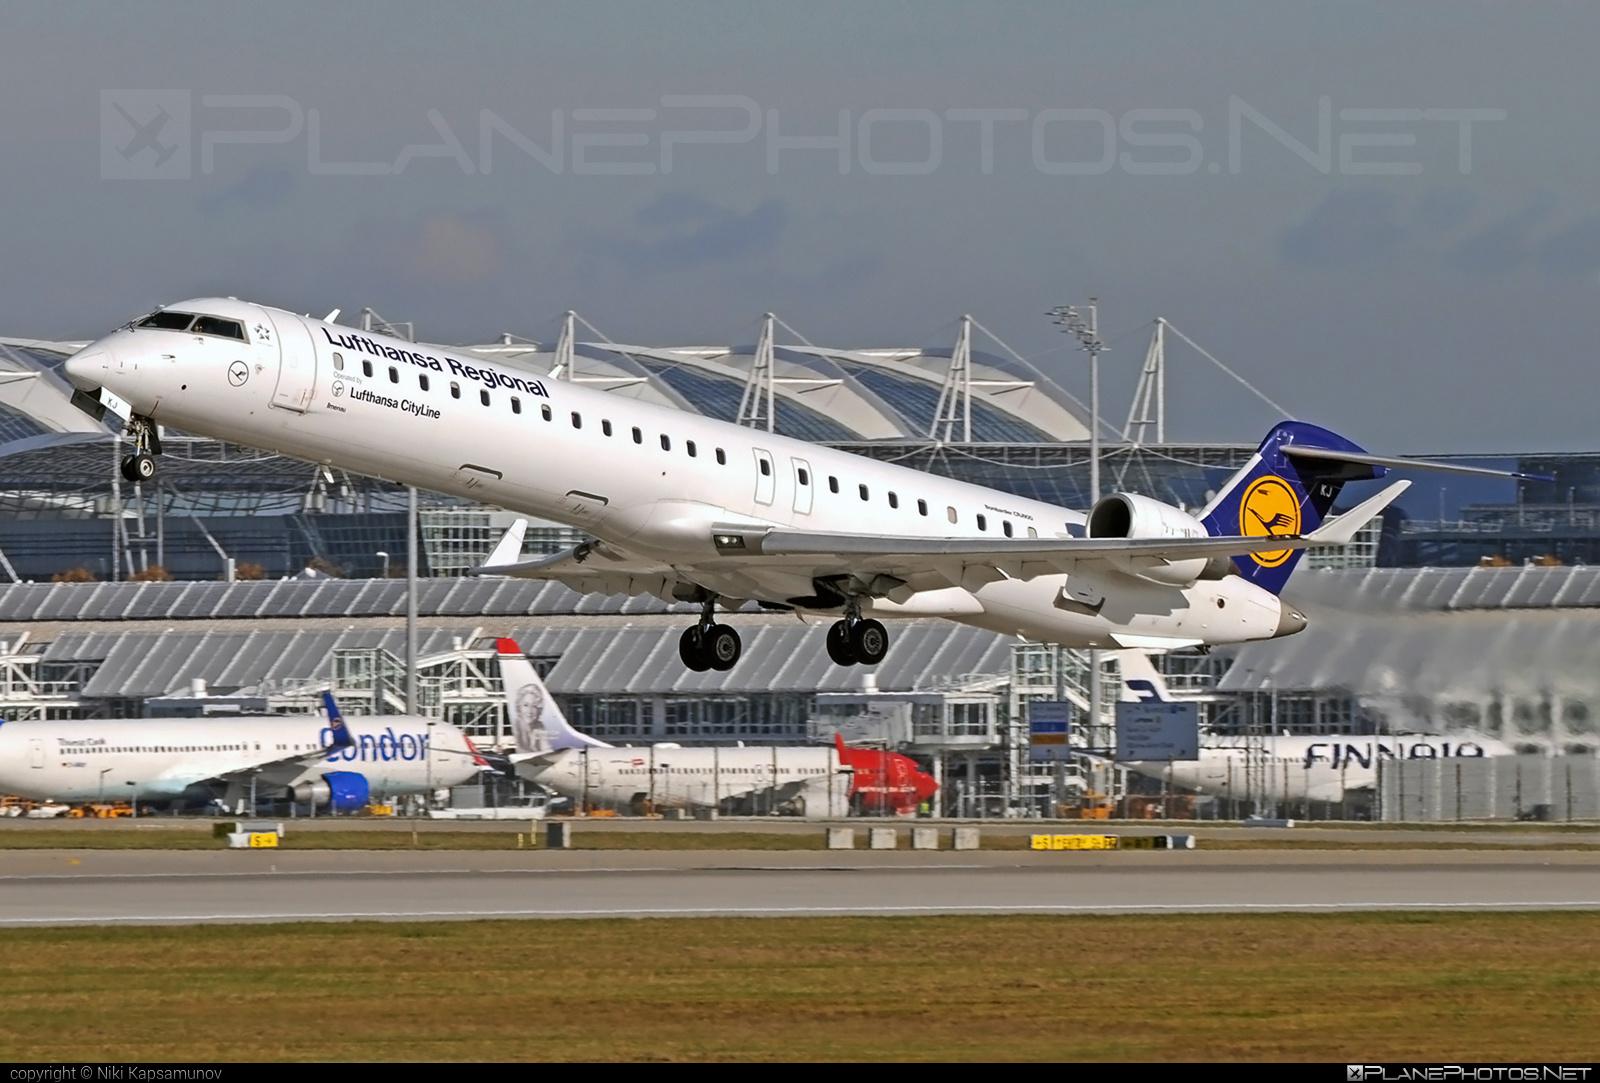 Bombardier CRJ900LR - D-ACKJ operated by Lufthansa CityLine #bombardier #crj900 #crj900lr #lufthansa #lufthansacityline